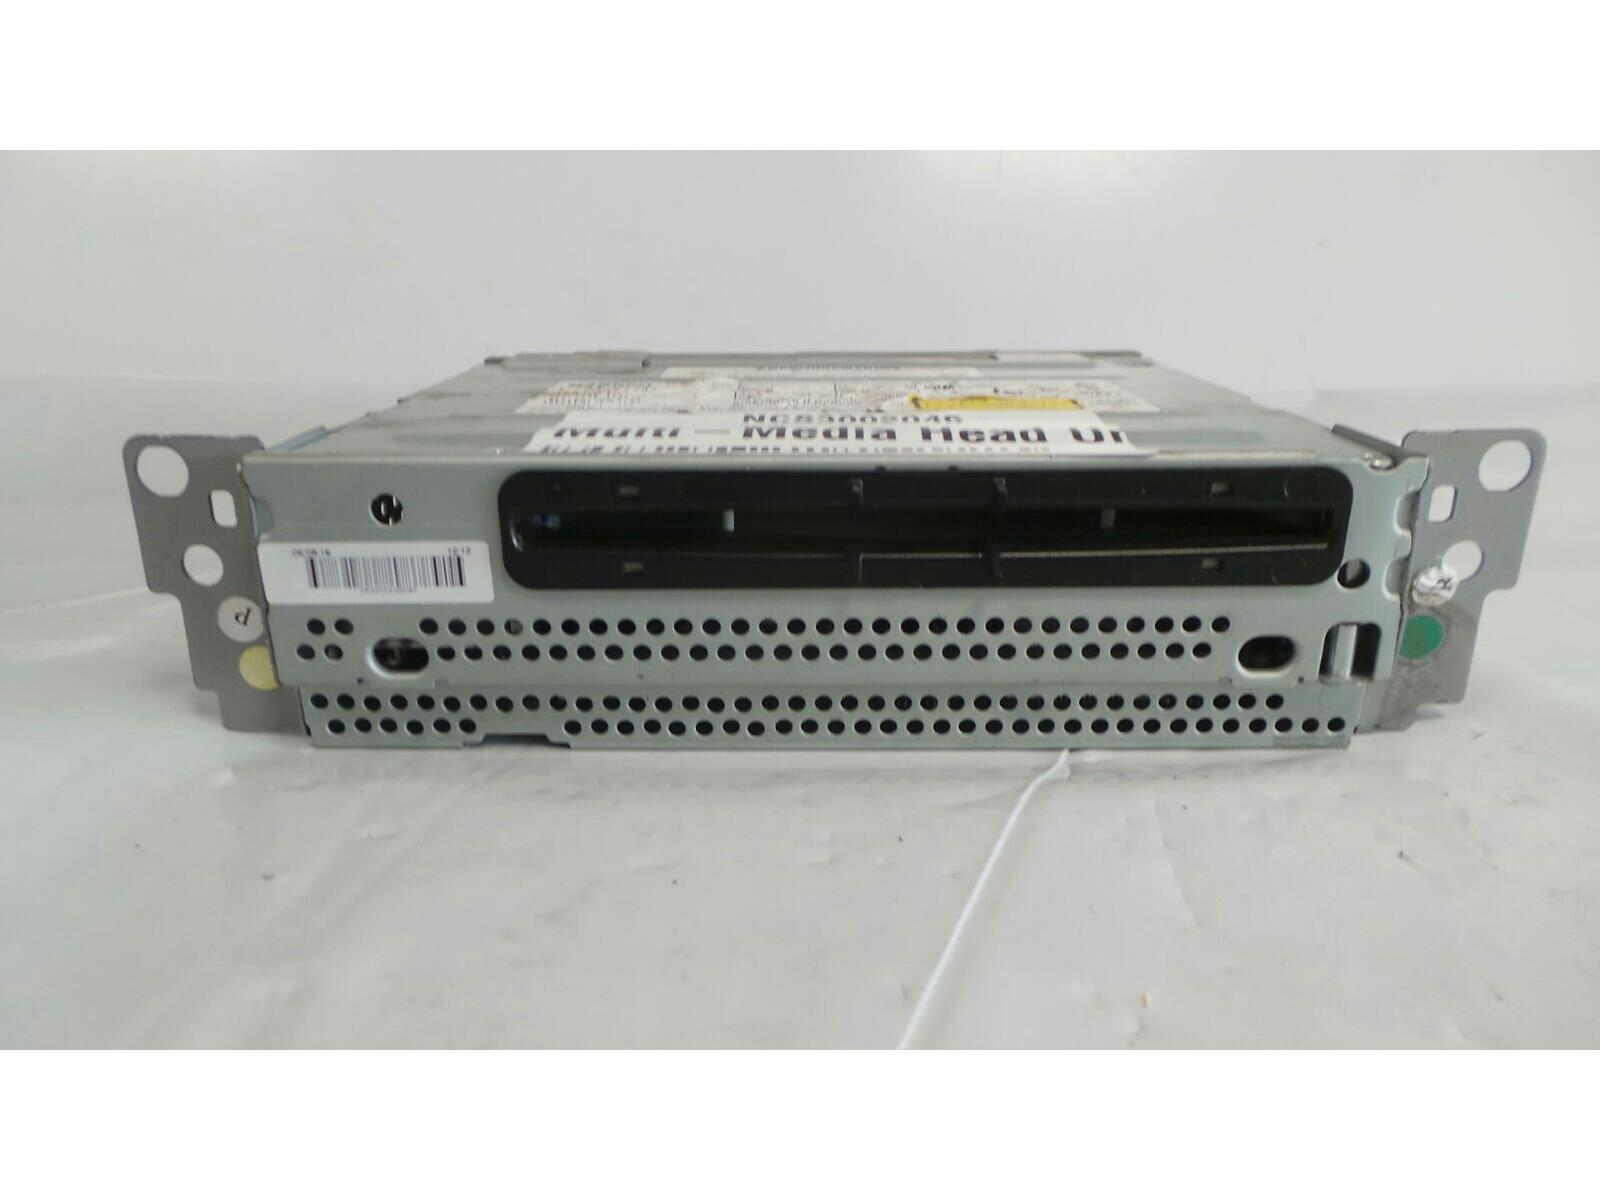 BMW Multimedia Untested May Need Coding CD/Radio  NAV/MAP CI 6 822 582